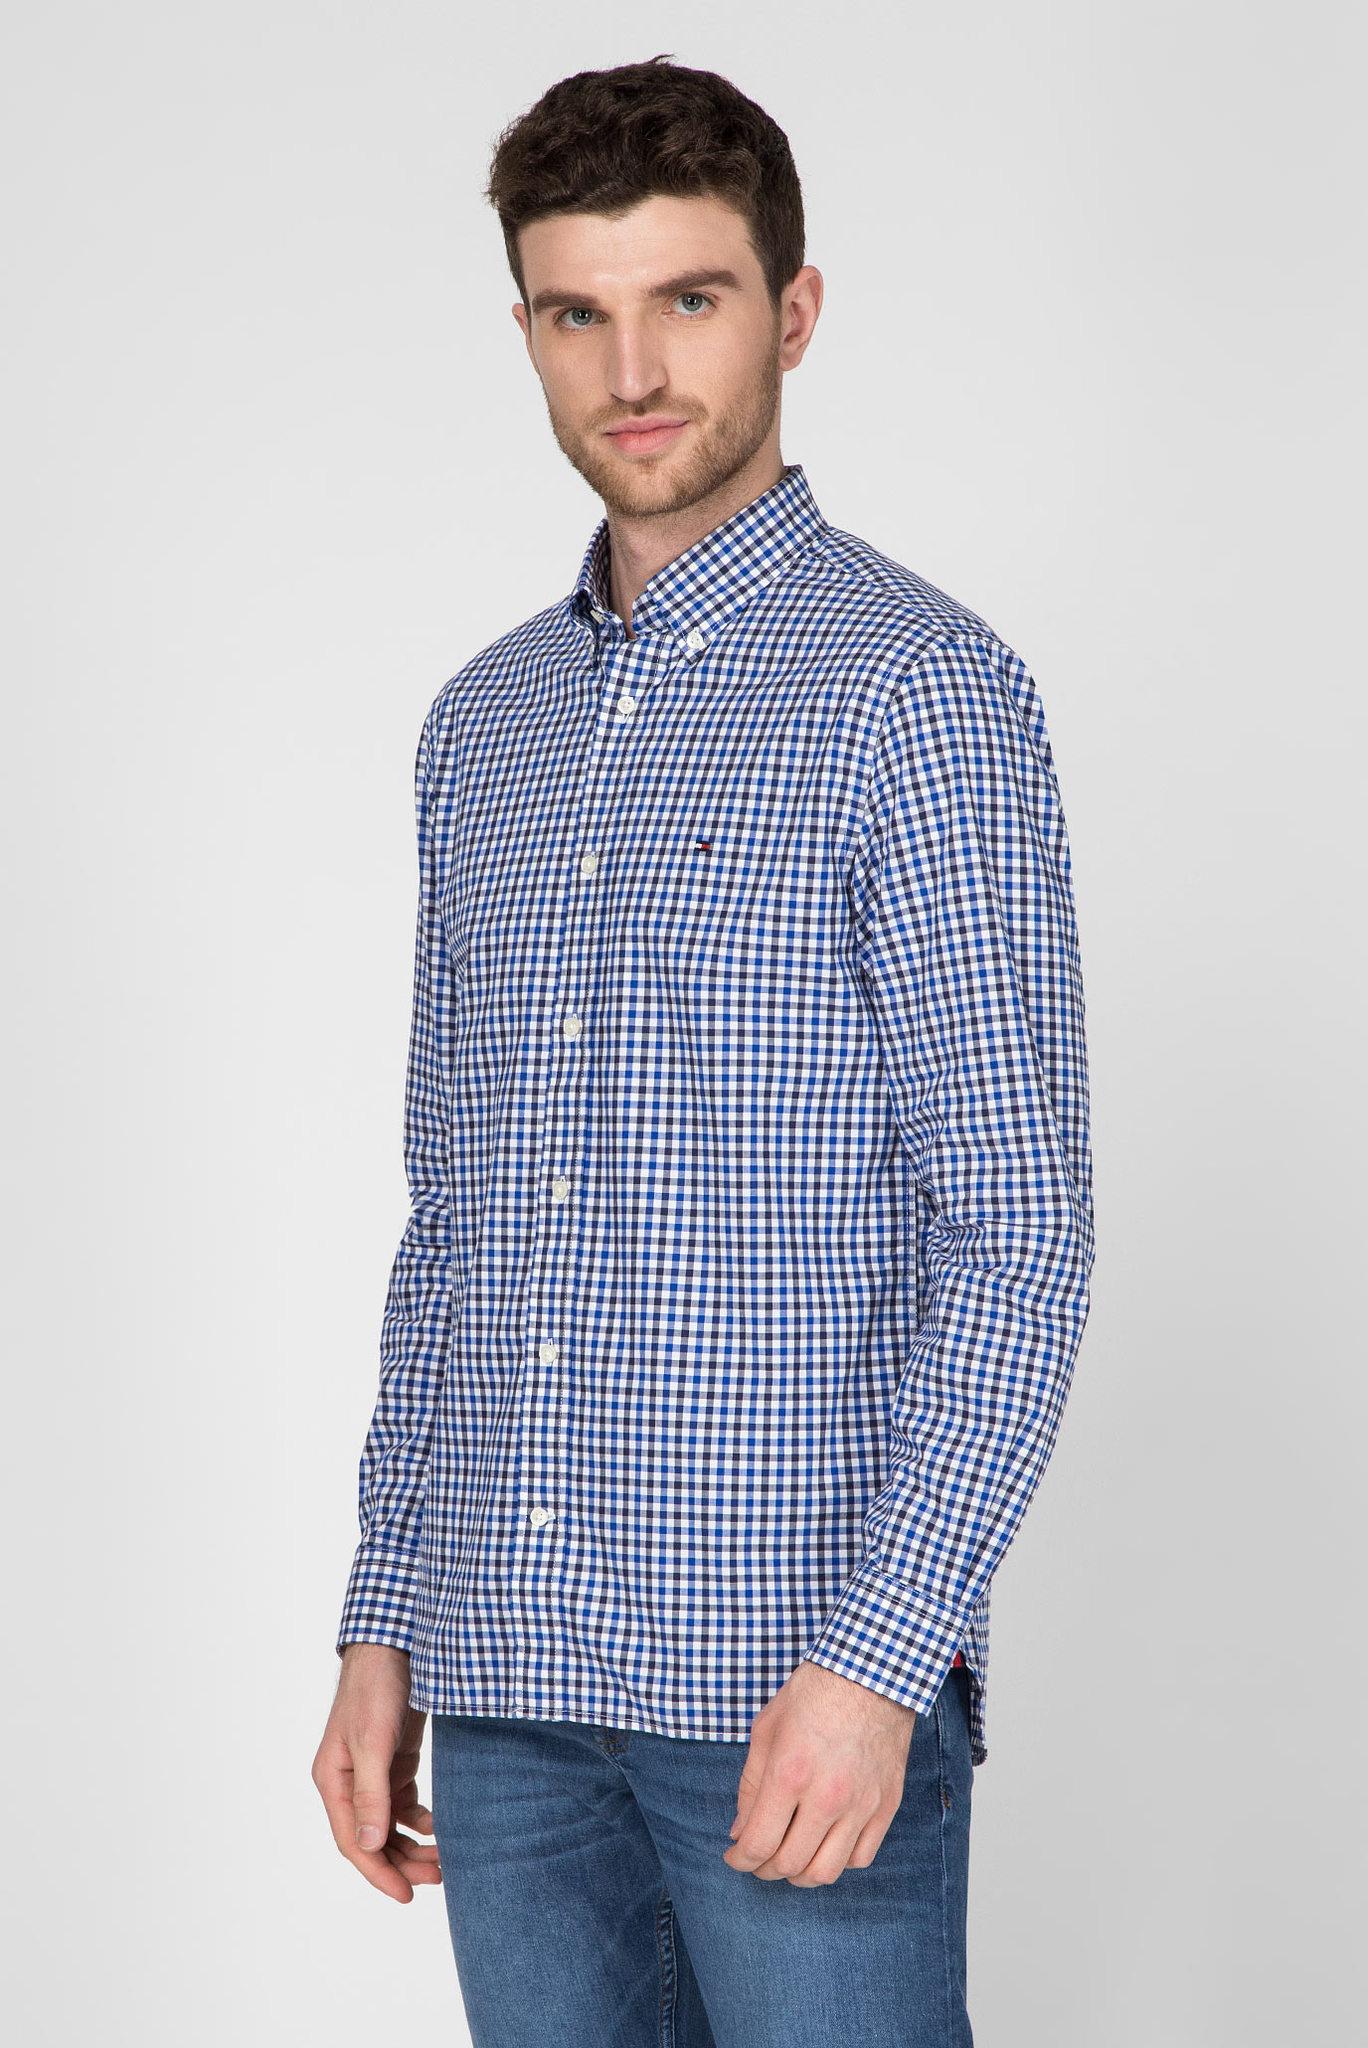 Мужская рубашка в клетку FLEX MULTI GINGHAM Tommy Hilfiger